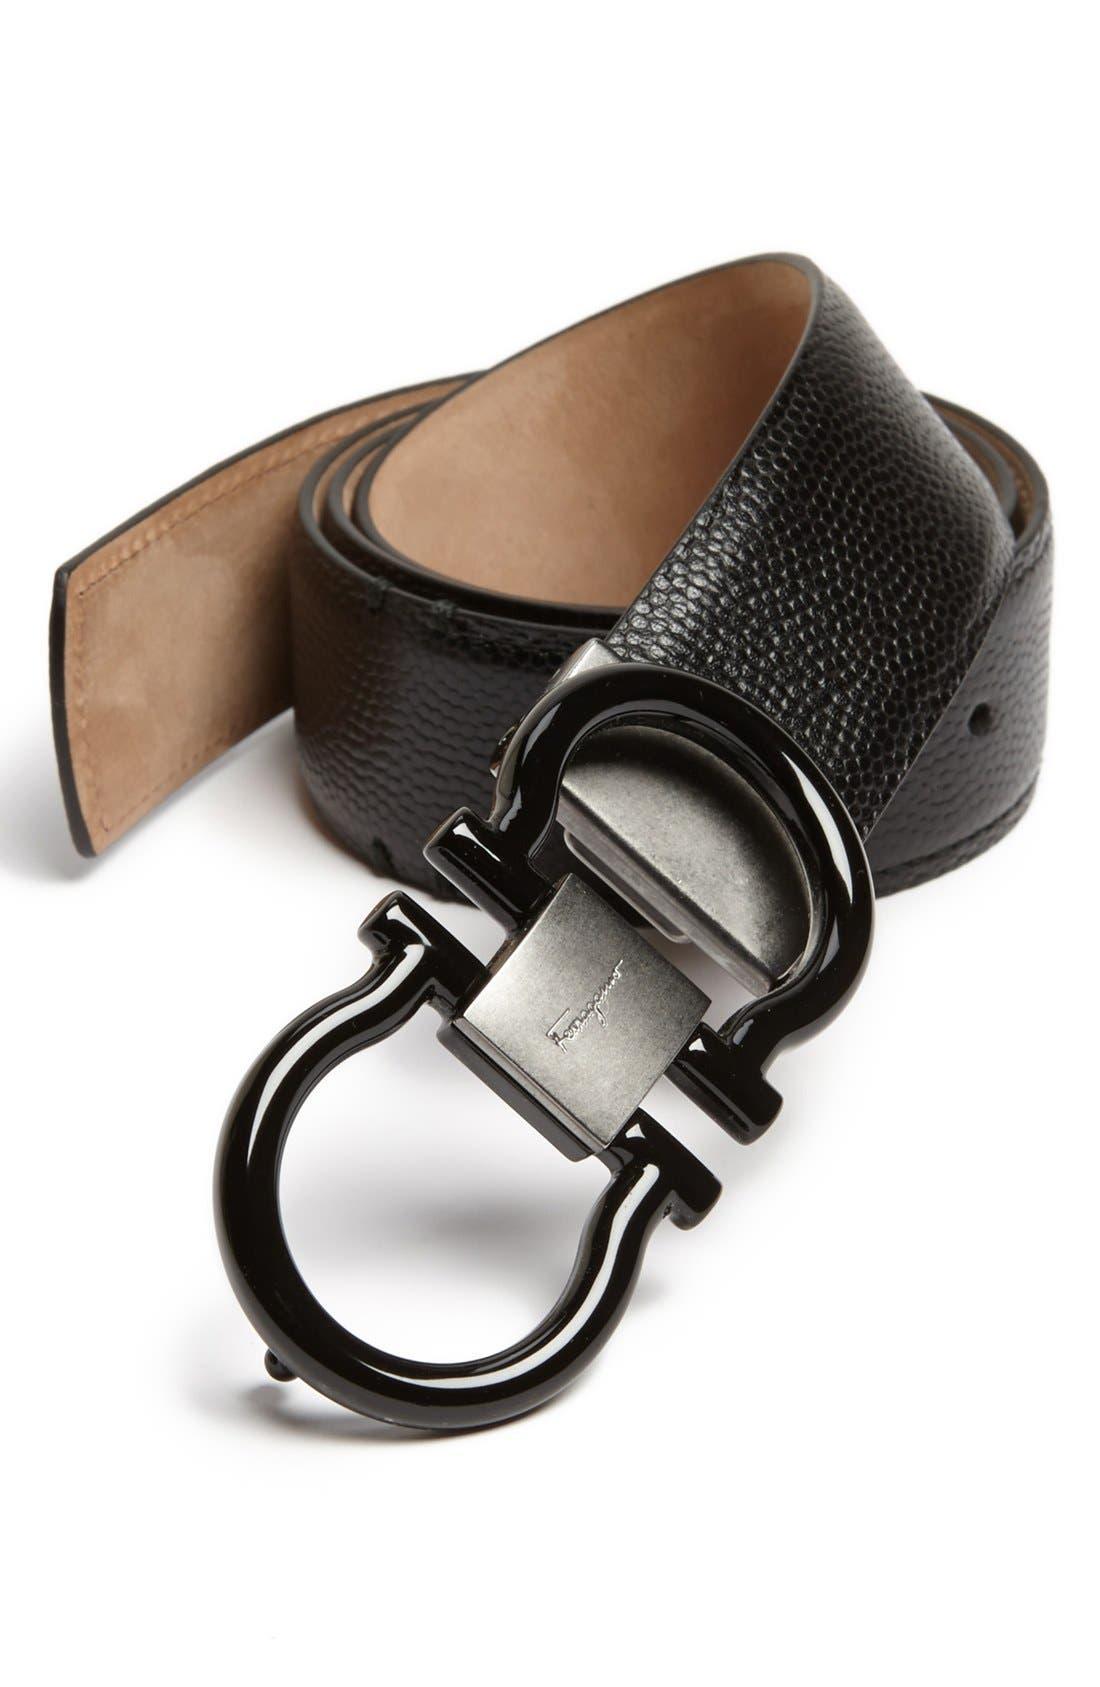 Main Image - Salvatore Ferragamo Calfskin Leather Belt